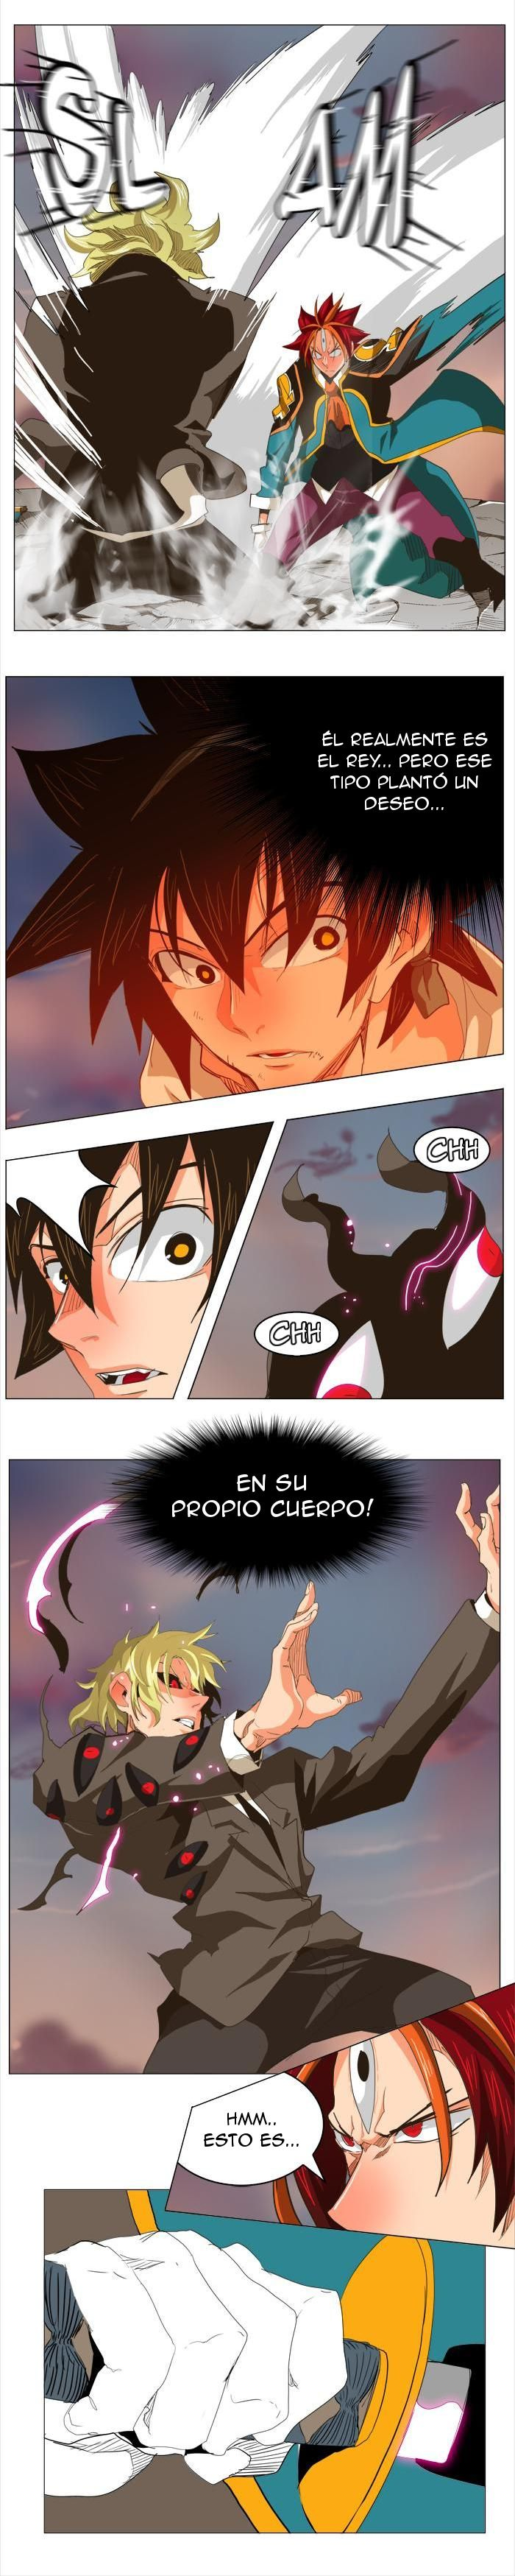 http://c5.ninemanga.com/es_manga/37/485/487894/4f67f486f9c069b4529a73c3f98642fe.jpg Page 7